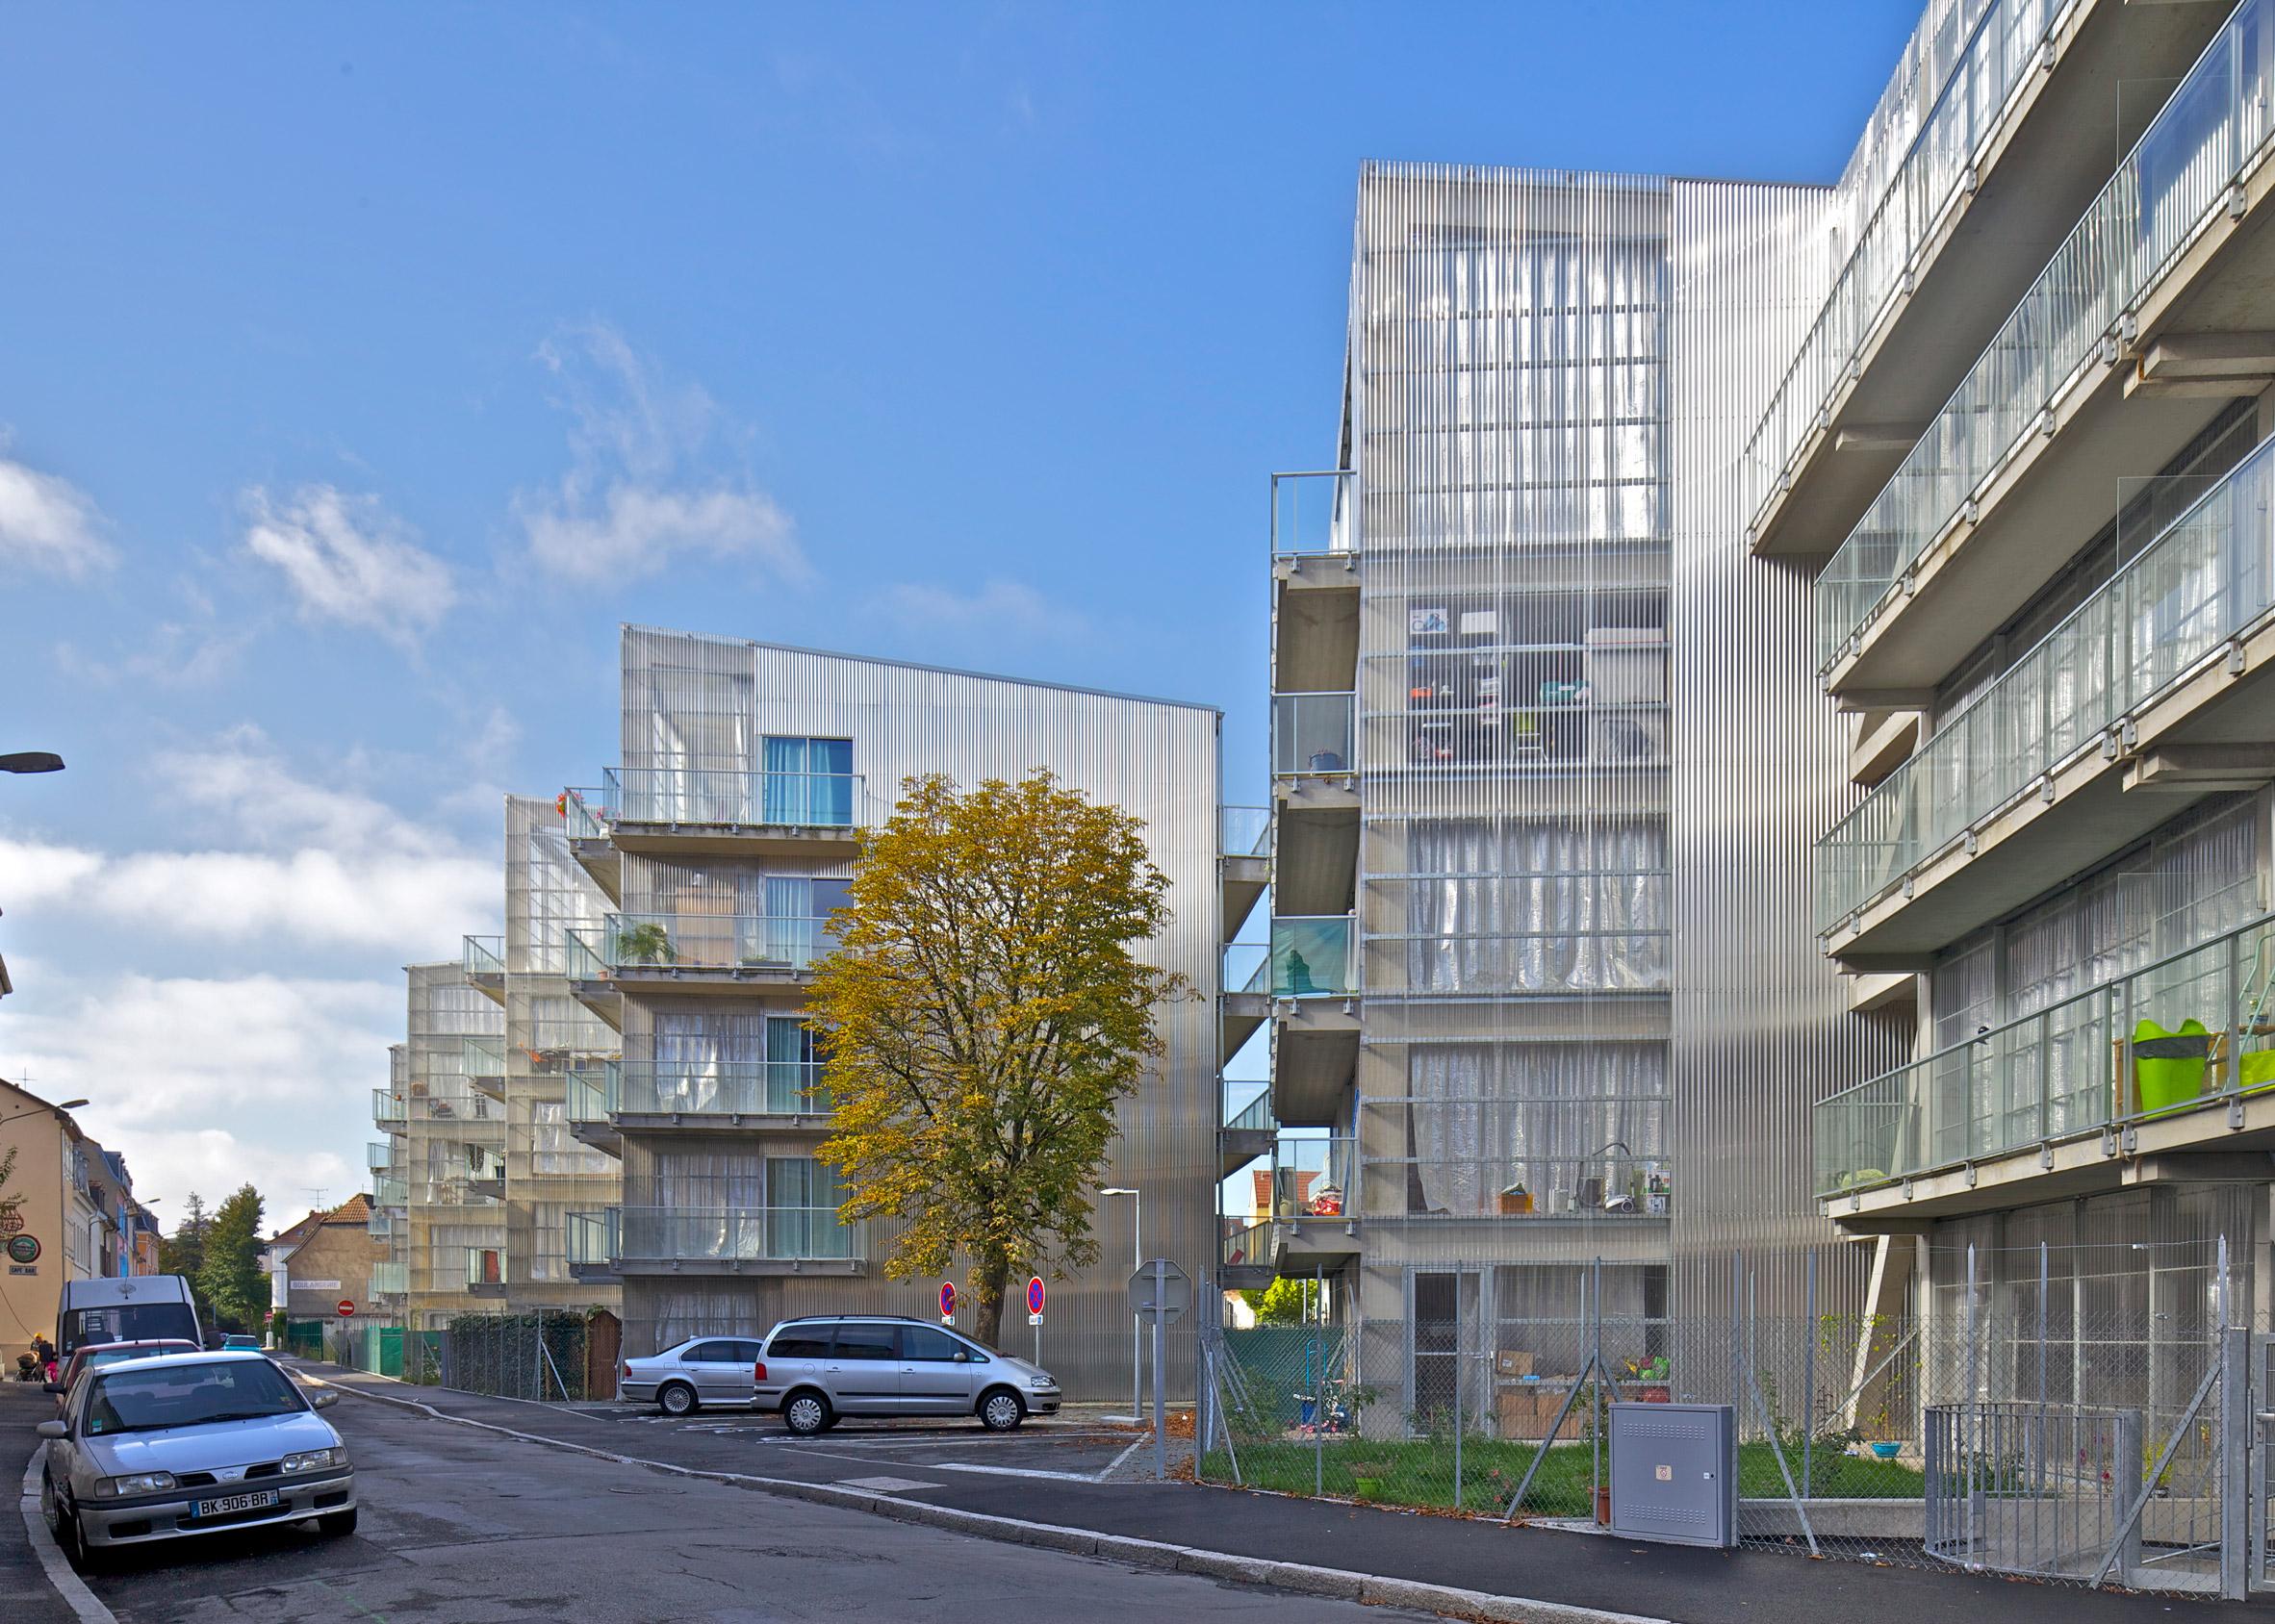 59 Dwellings, Neppert Gardens Social Housing, Haut-Rhin, by Lacaton & Vassal architectes